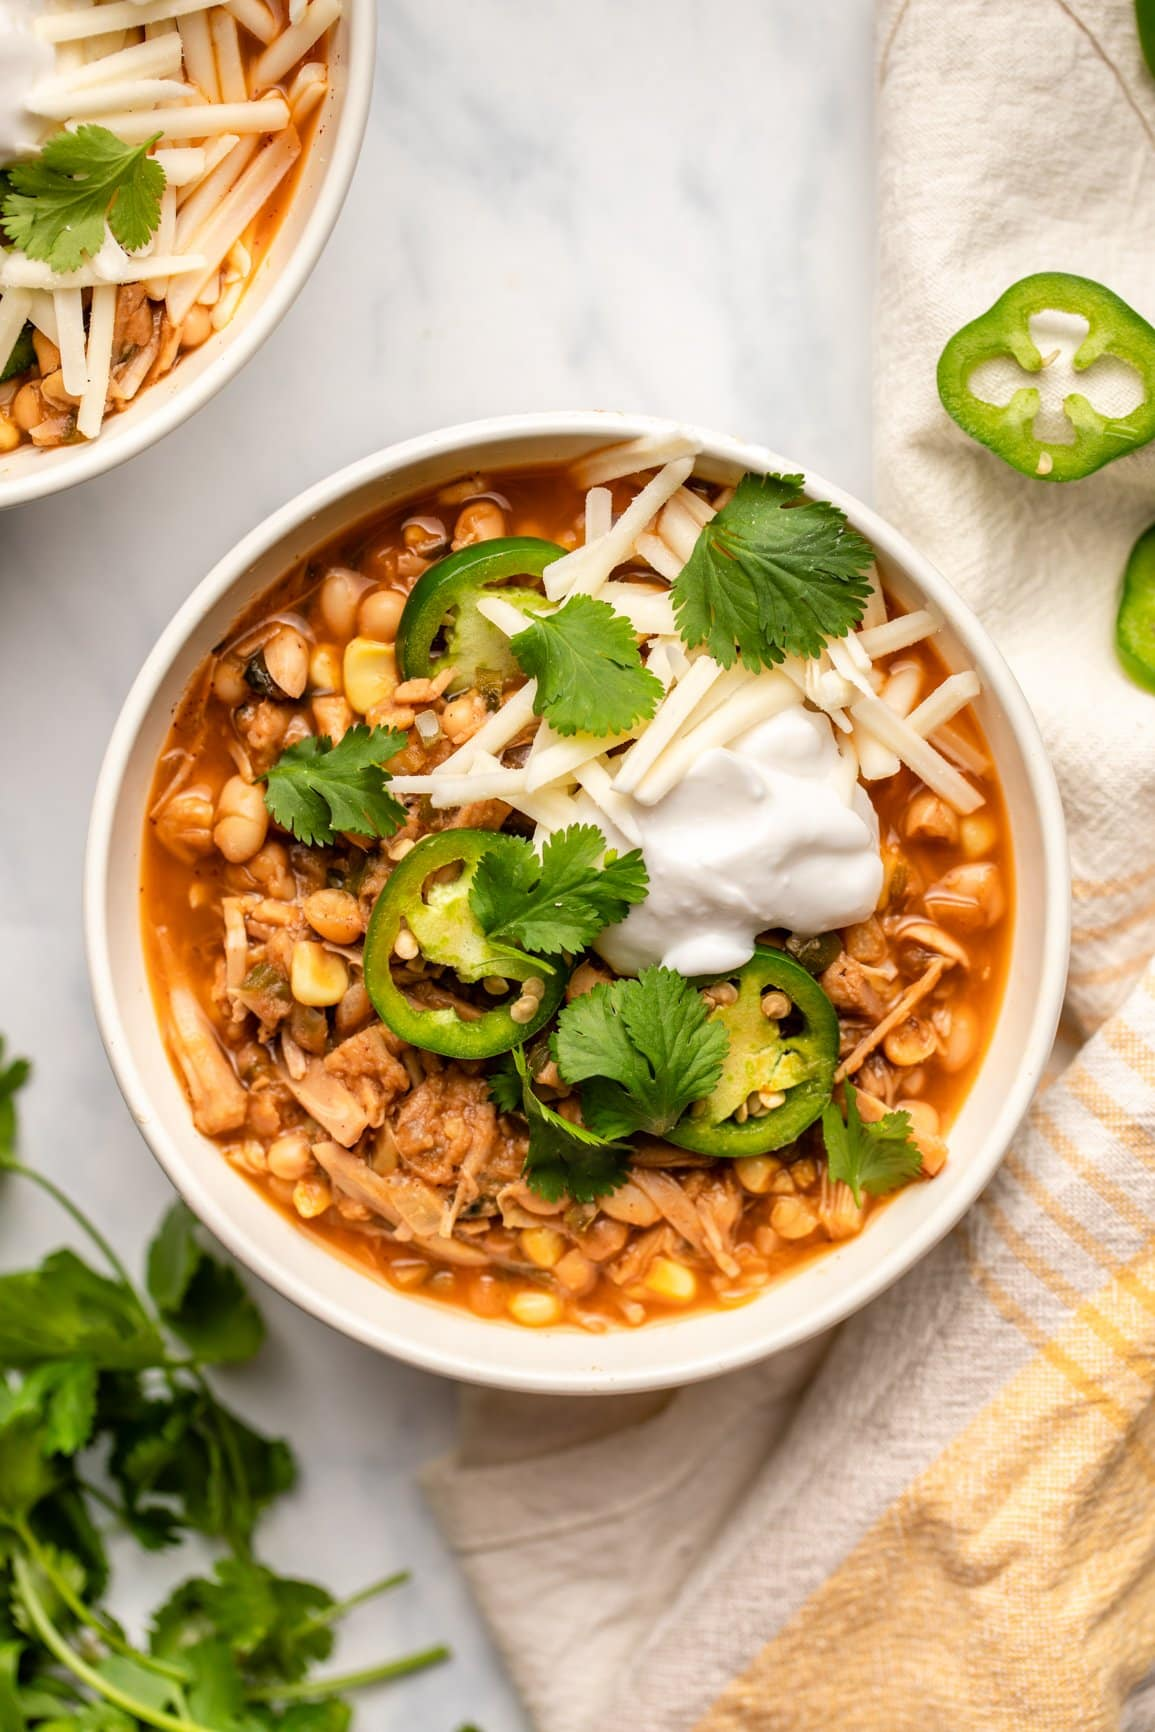 bowl of vegan white bean chili topped with jalapeno, vegan cheese, and vegan sour cream